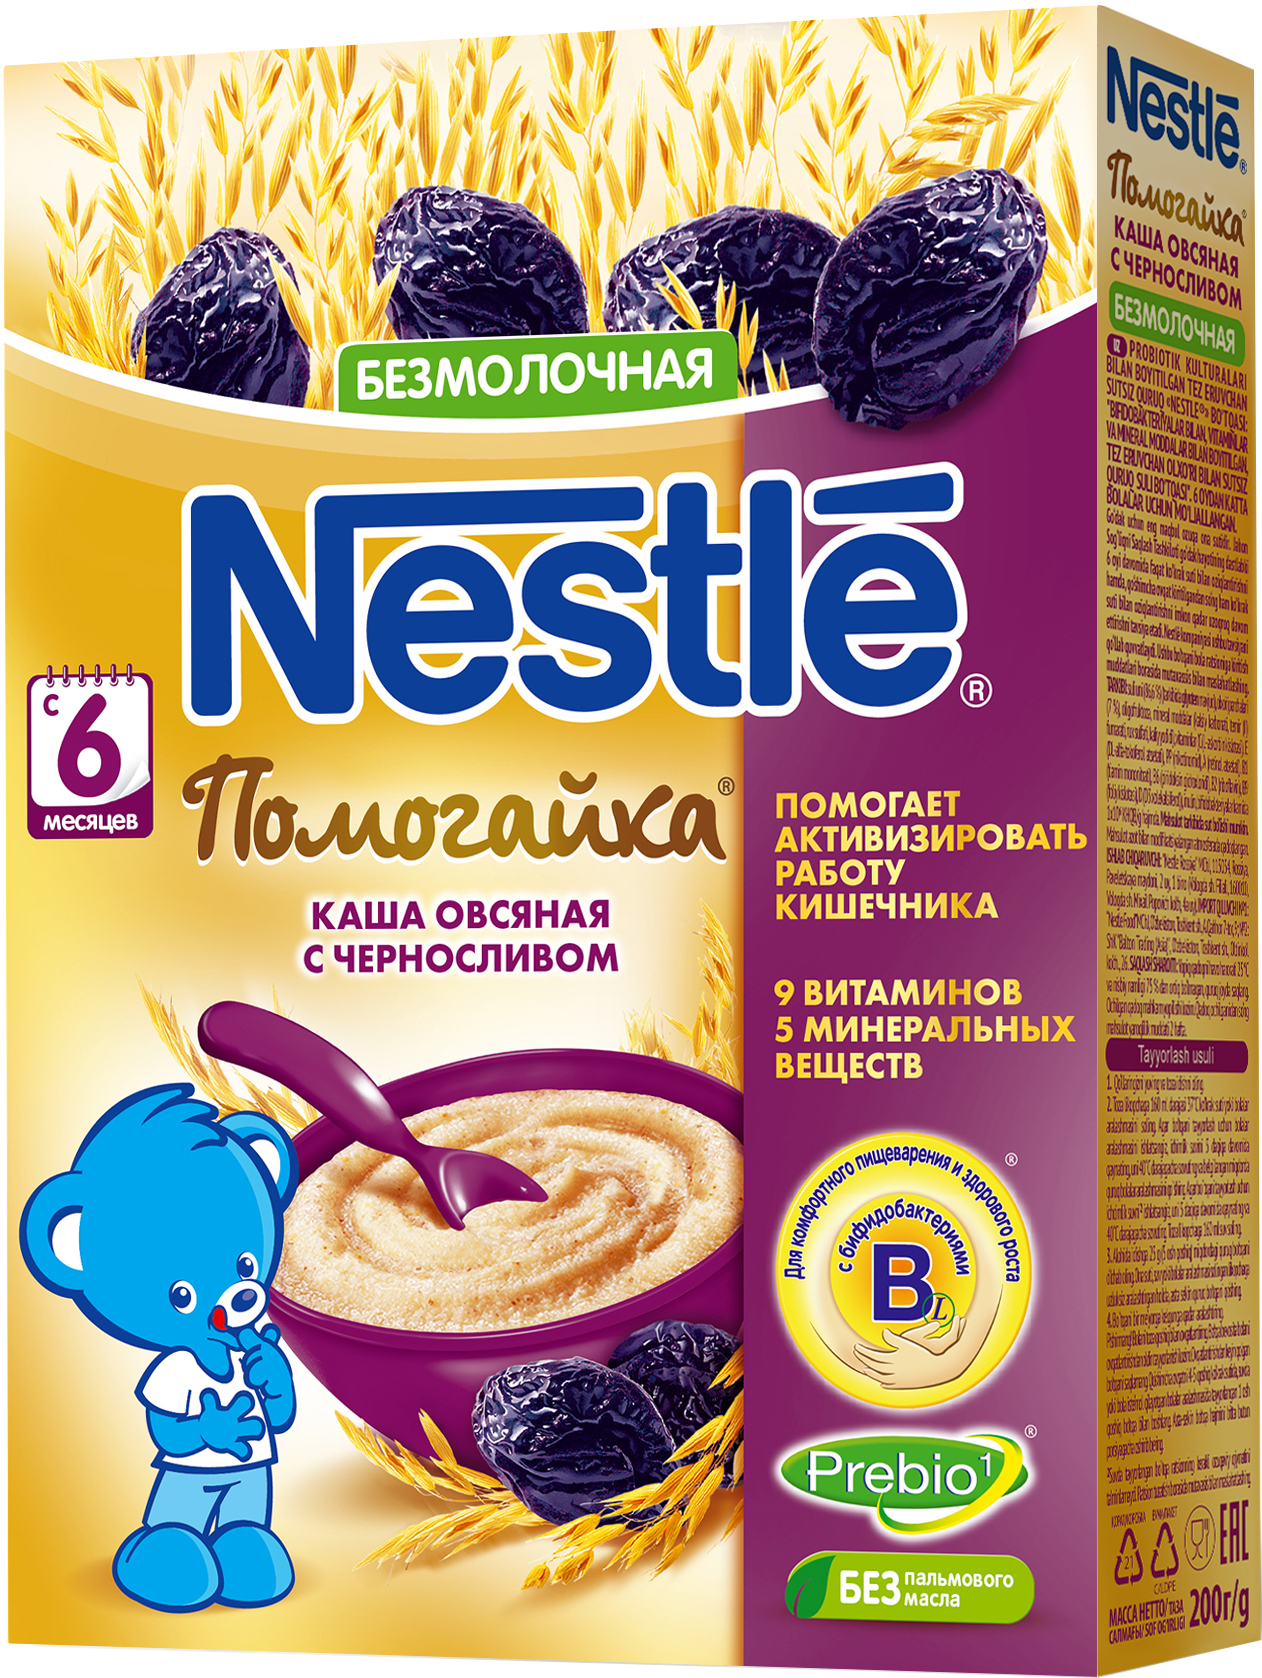 Каши Nestle Каша безмолочная Nestle Помогайка овсяная с черносливом с 6 мес. 200 г каши nestle каша безмолочная nestle гречневая гипоаллергенная с 4 мес 160 г